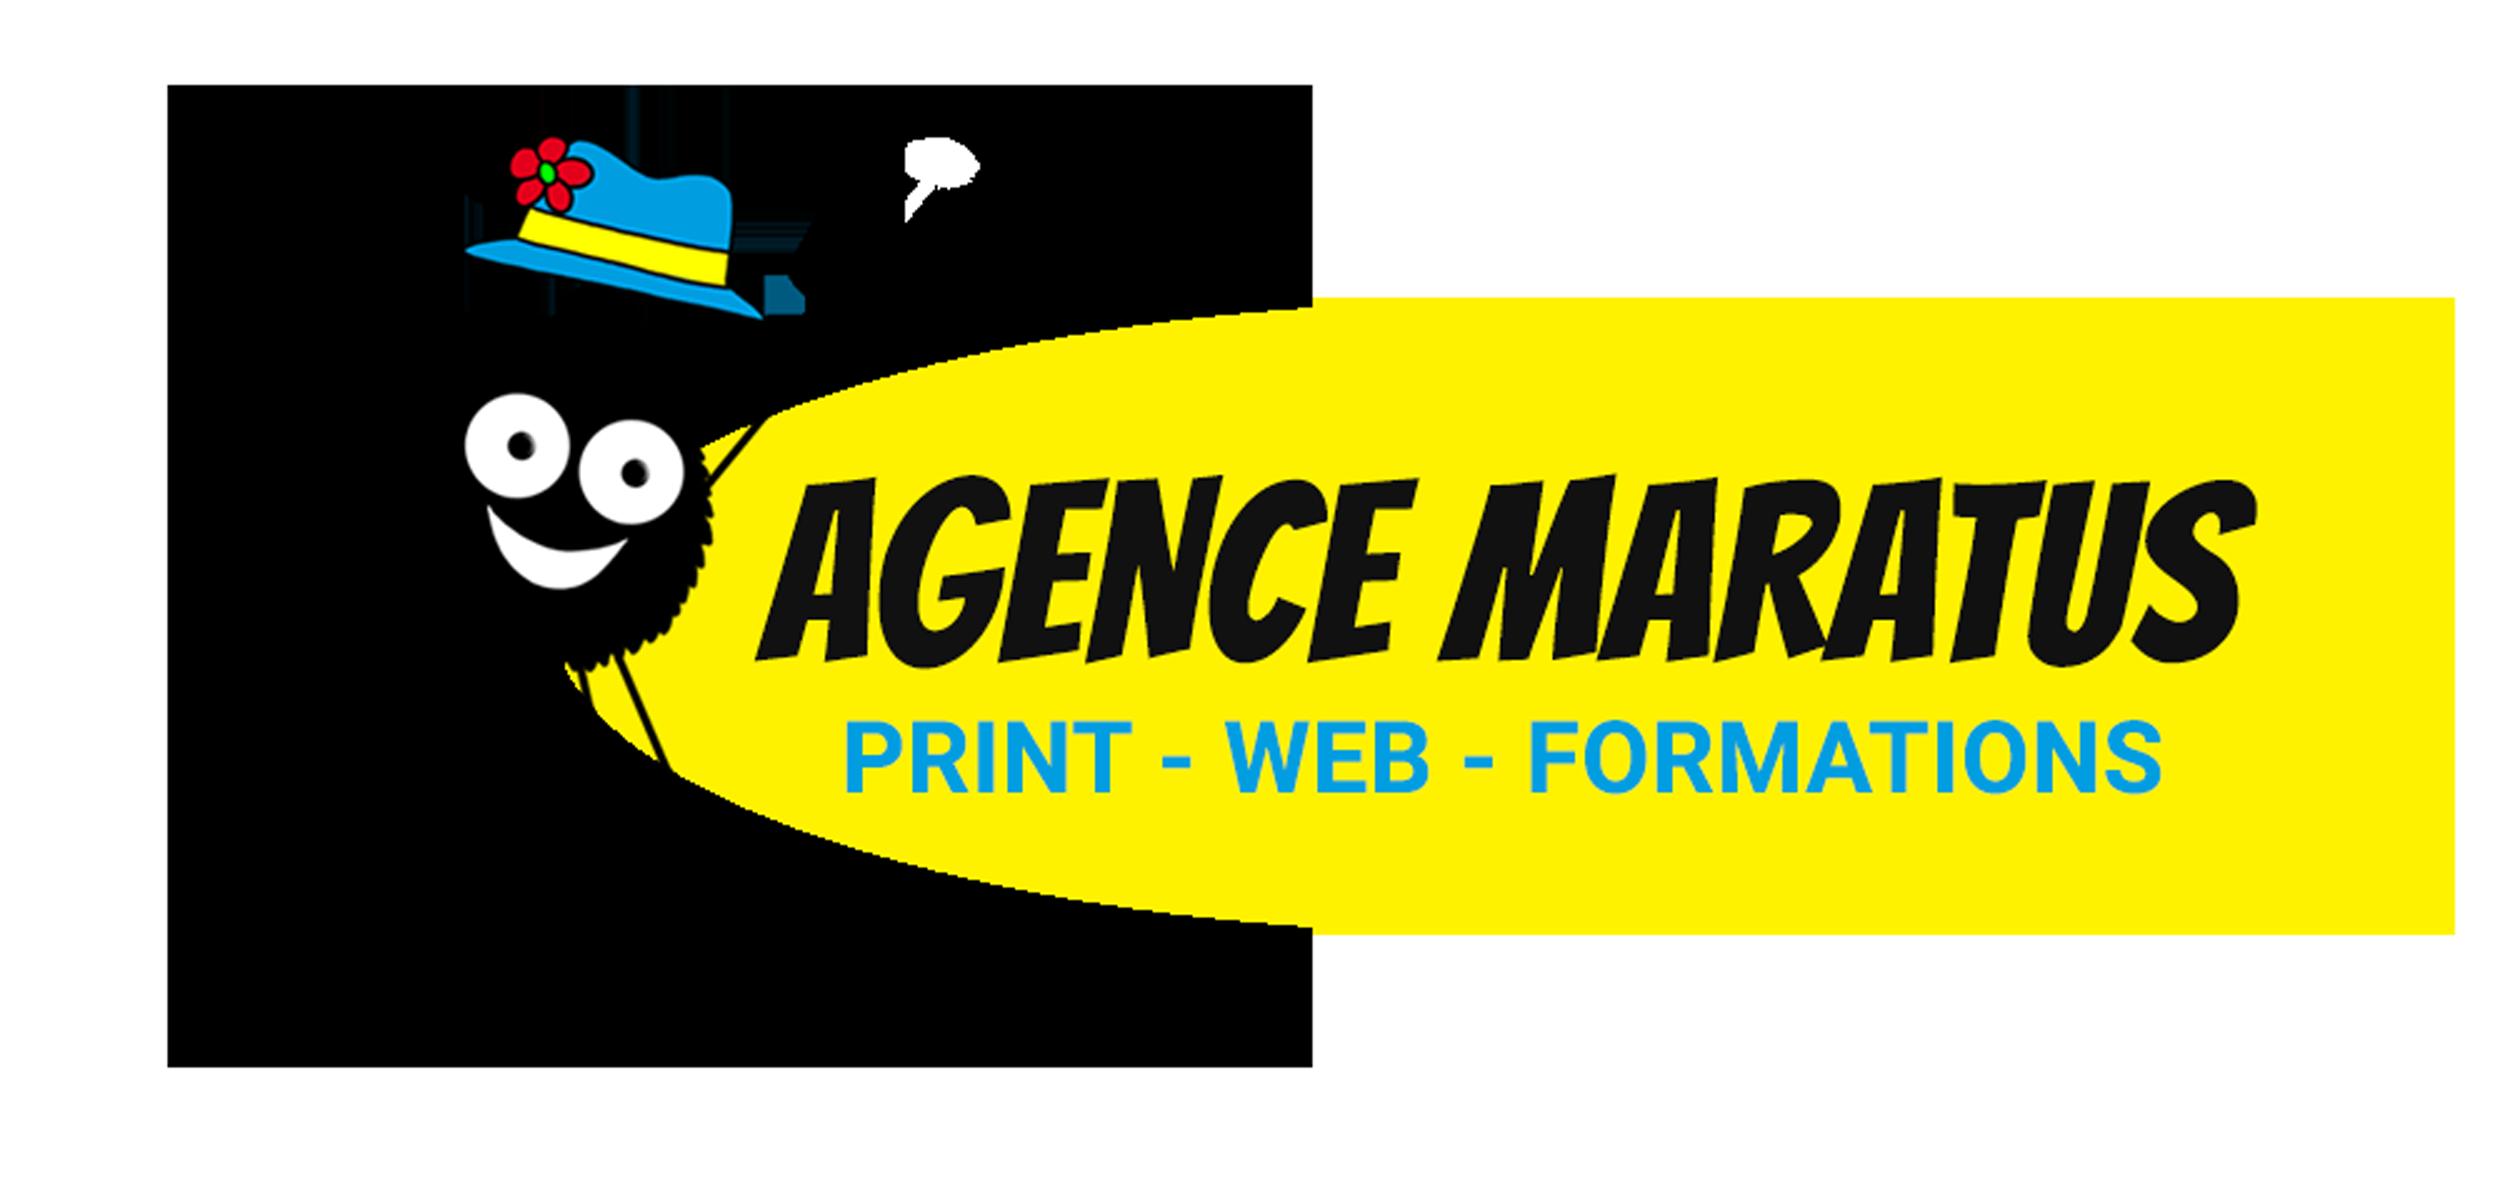 nouveau-logo-agence-maratus